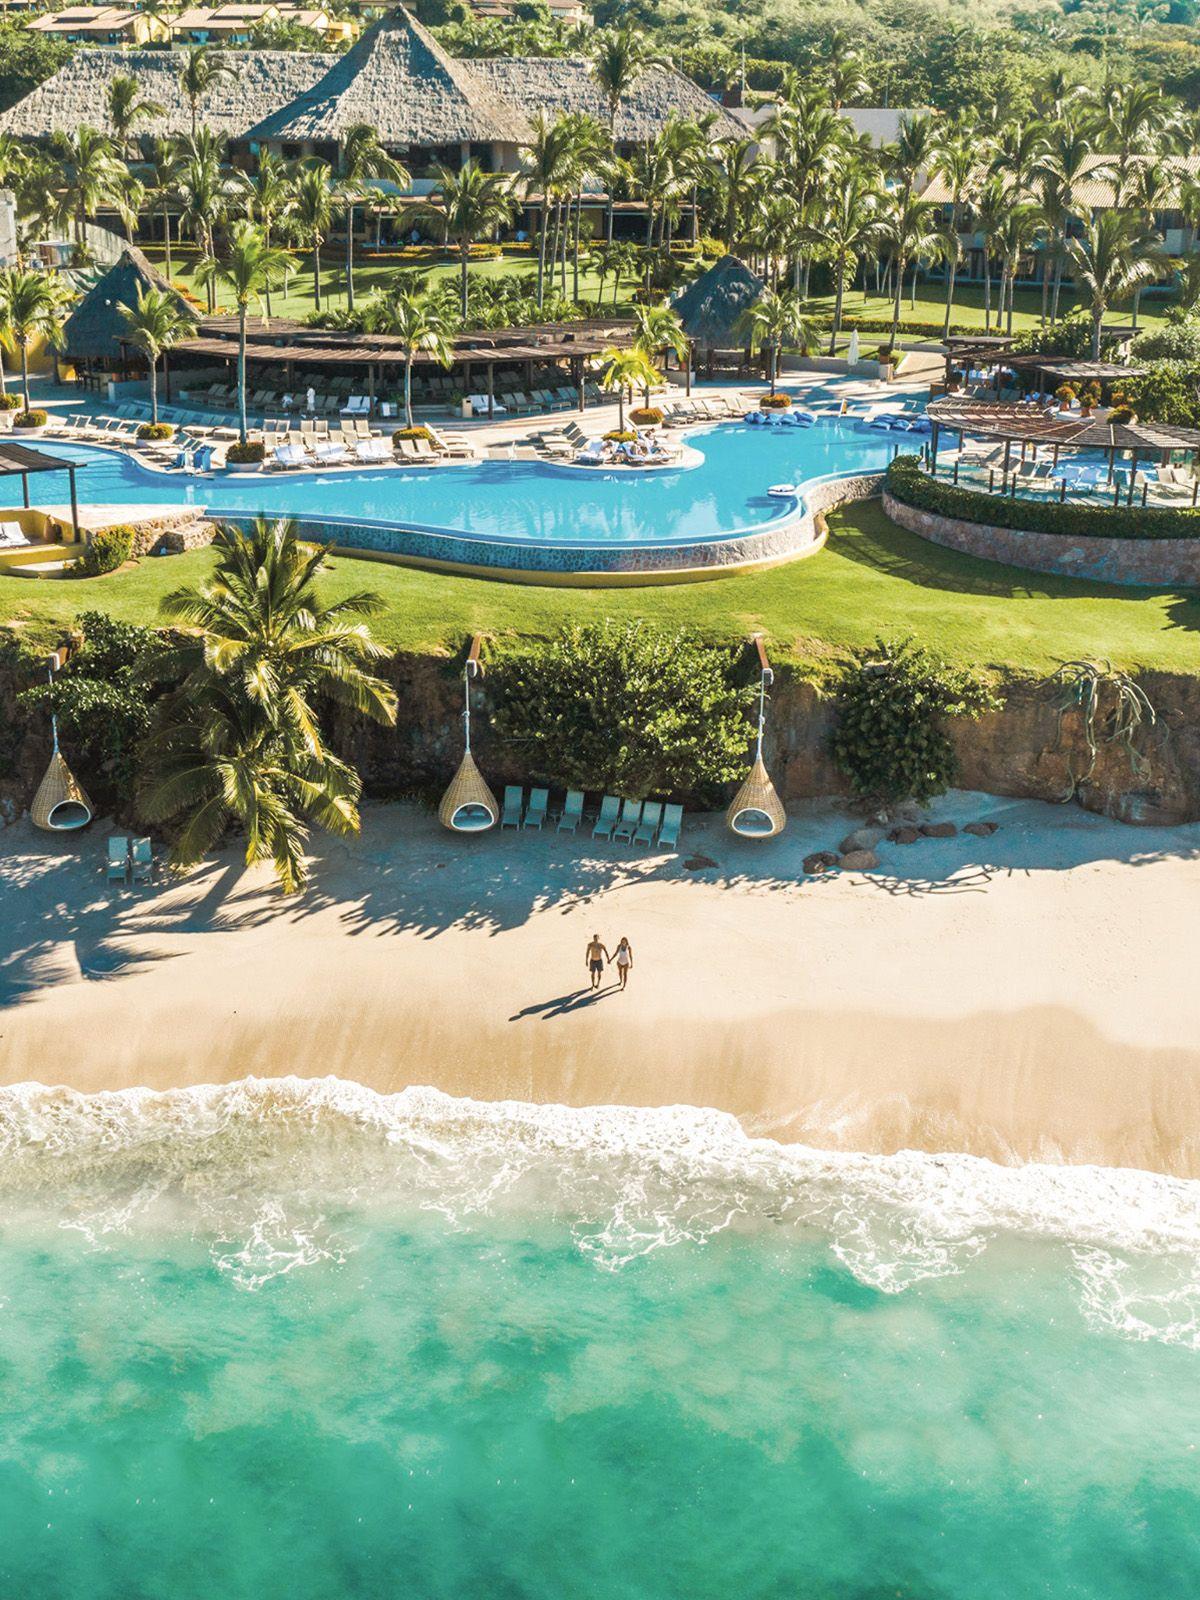 Mexico Te Amo 3 Resorts For Dreamy Retreats Resort Hotels And Resorts Future Travel